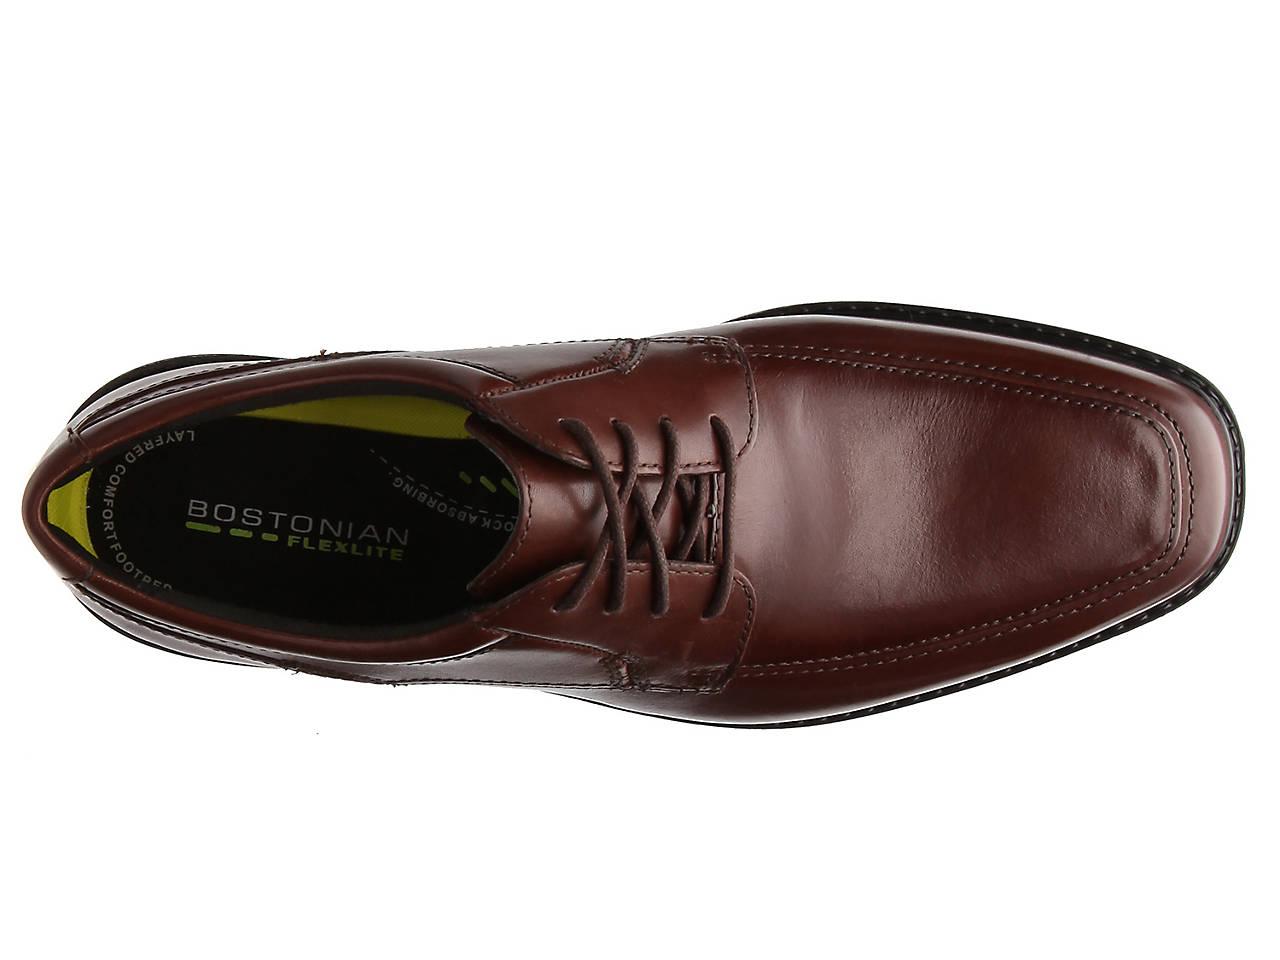 b6b99a4811 Bostonian Commonwealth Ipswich Apron Oxford Men s Shoes